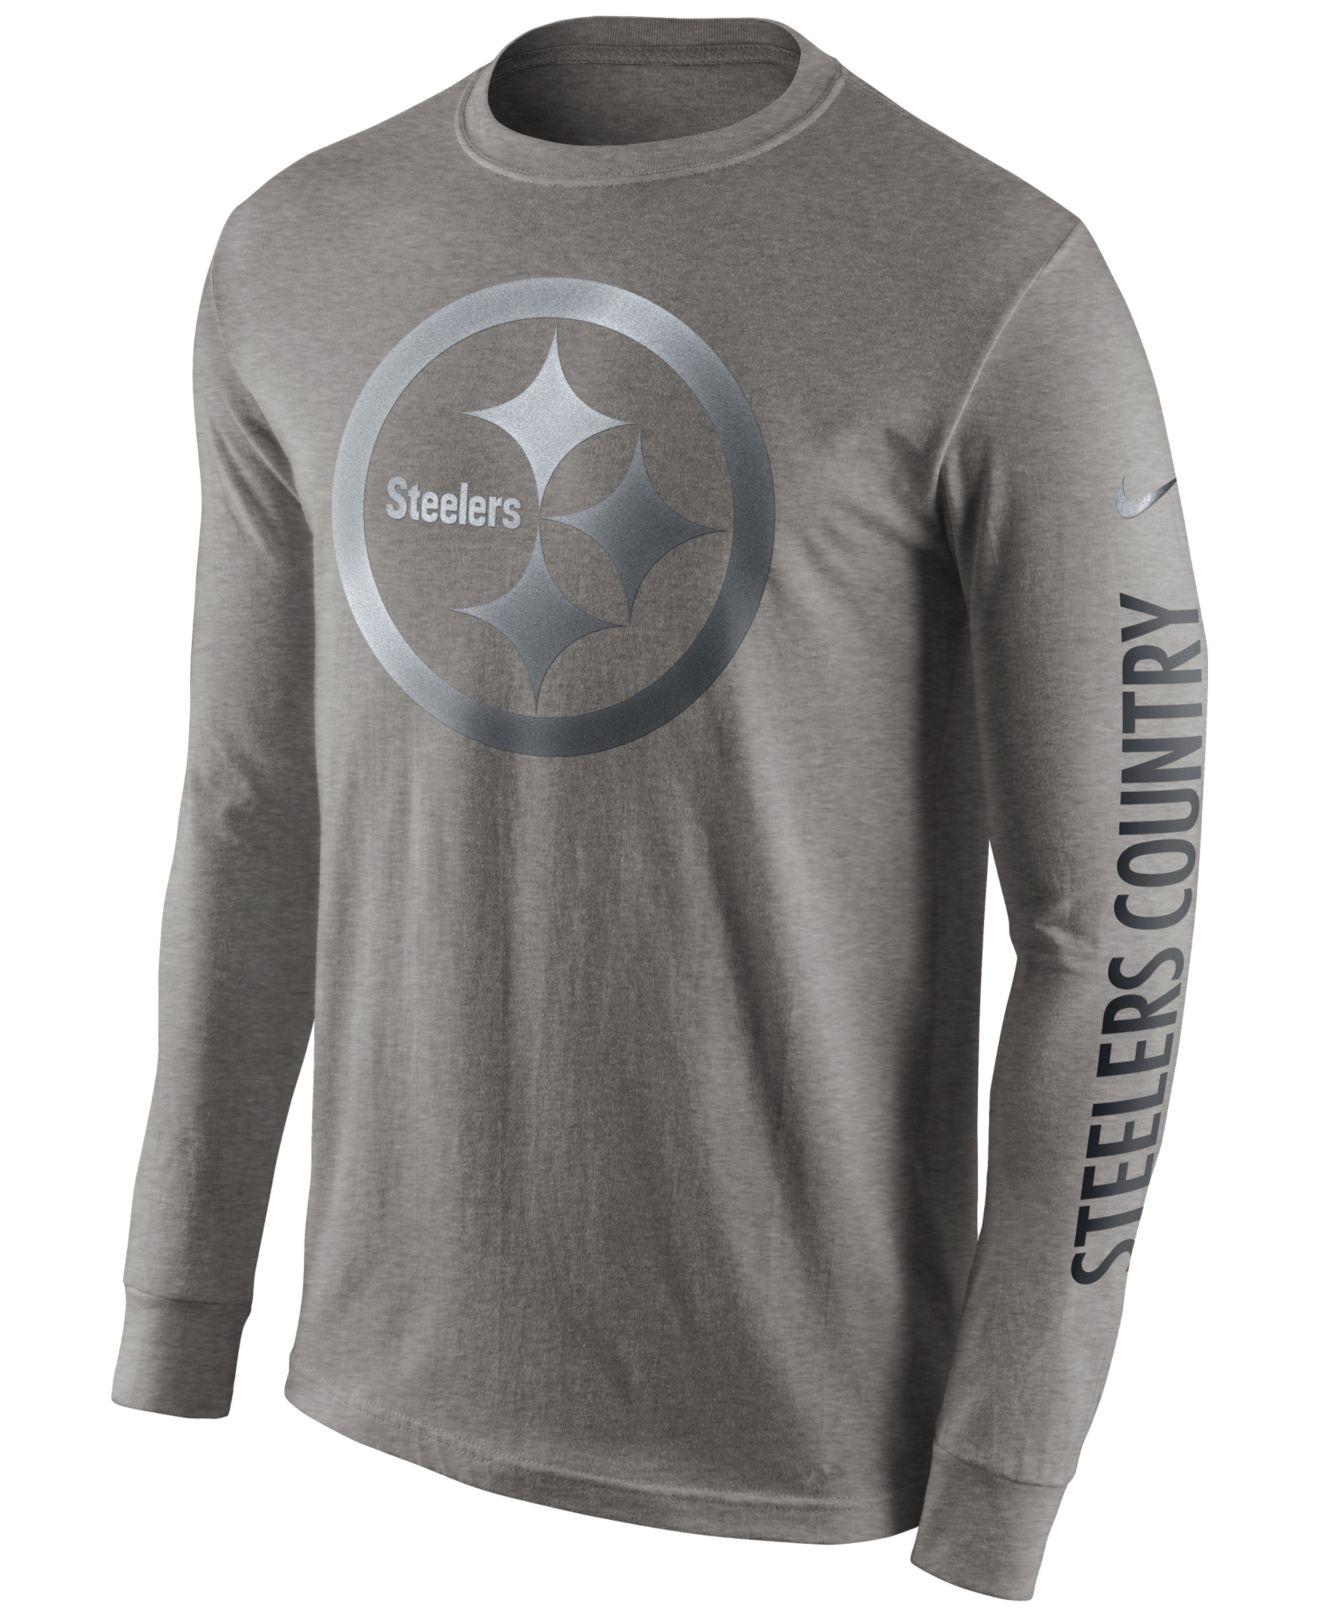 8c2bd3b9 Nike Men's Long-sleeve Pittsburgh Steelers Reflective T-shirt in ...